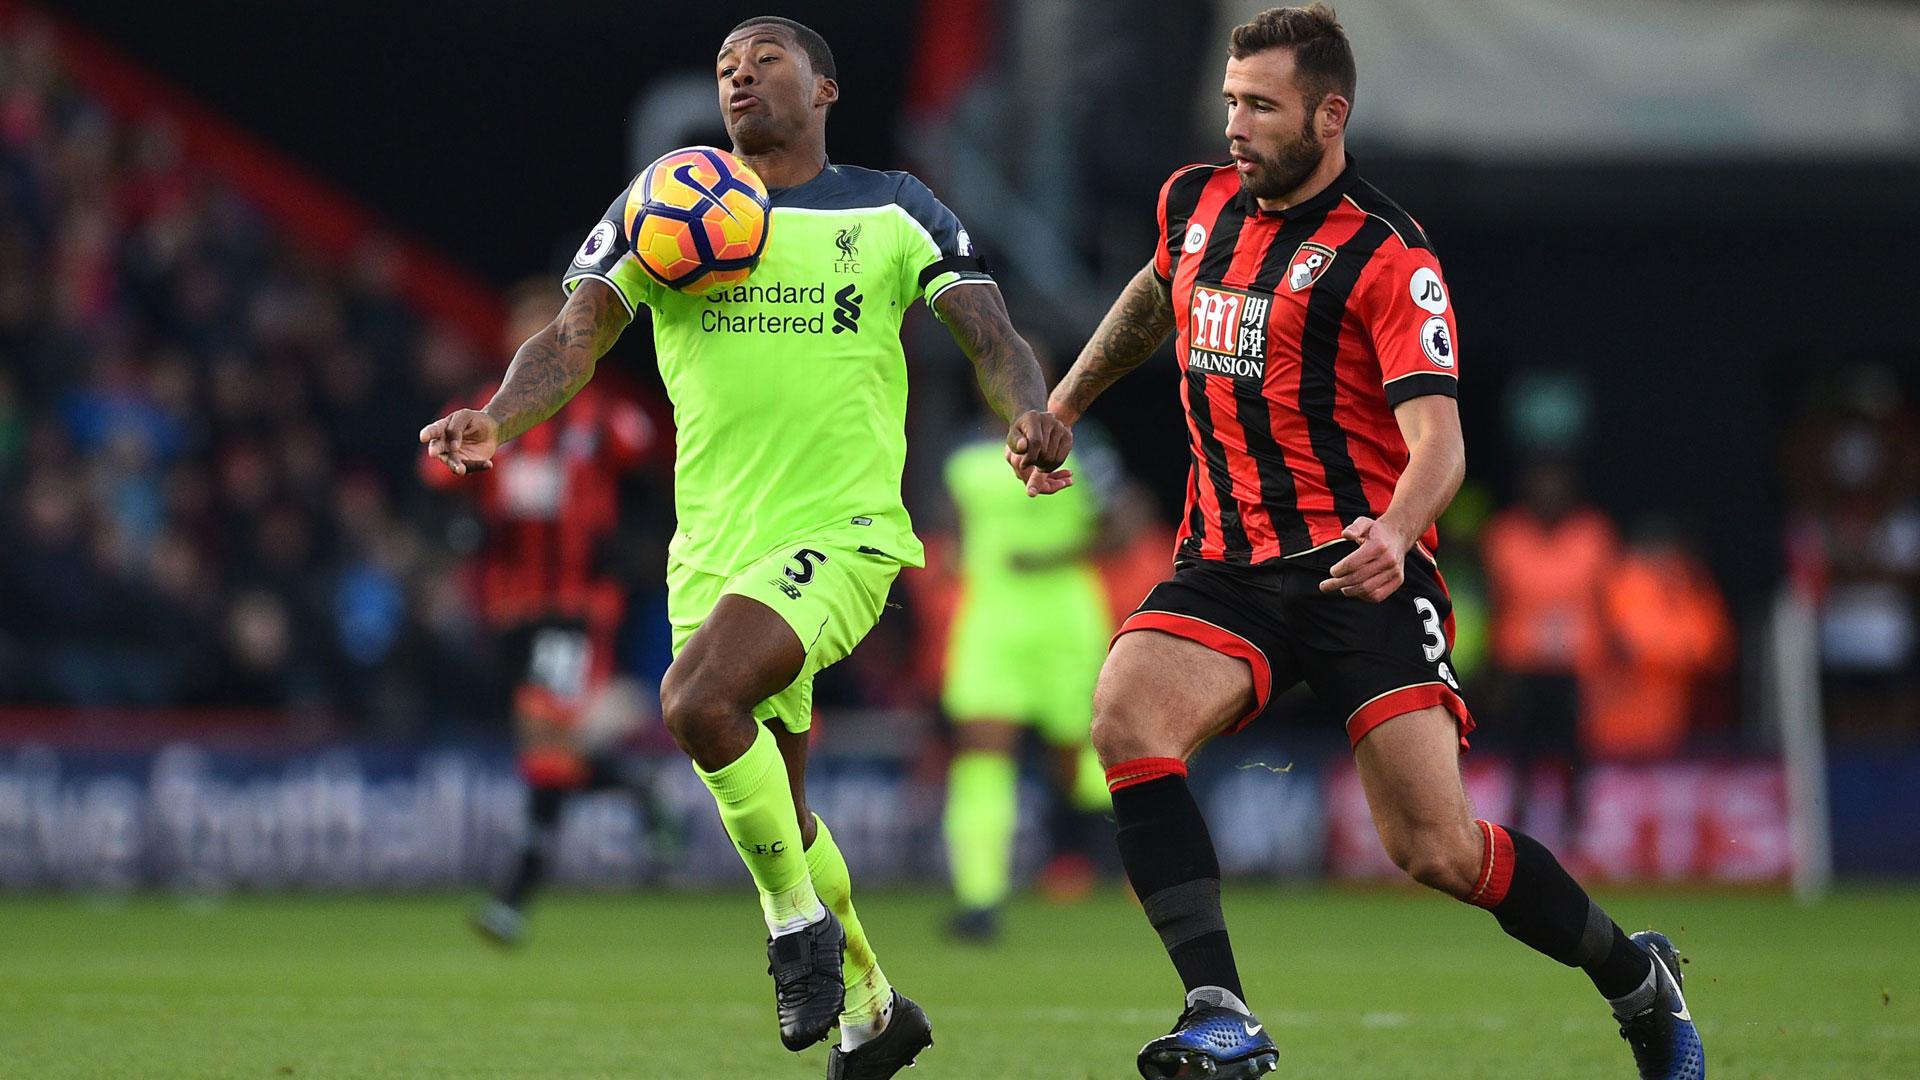 Foot/Angleterre - Liverpool: Klopp va tenter de vendre Sakho cet hiver